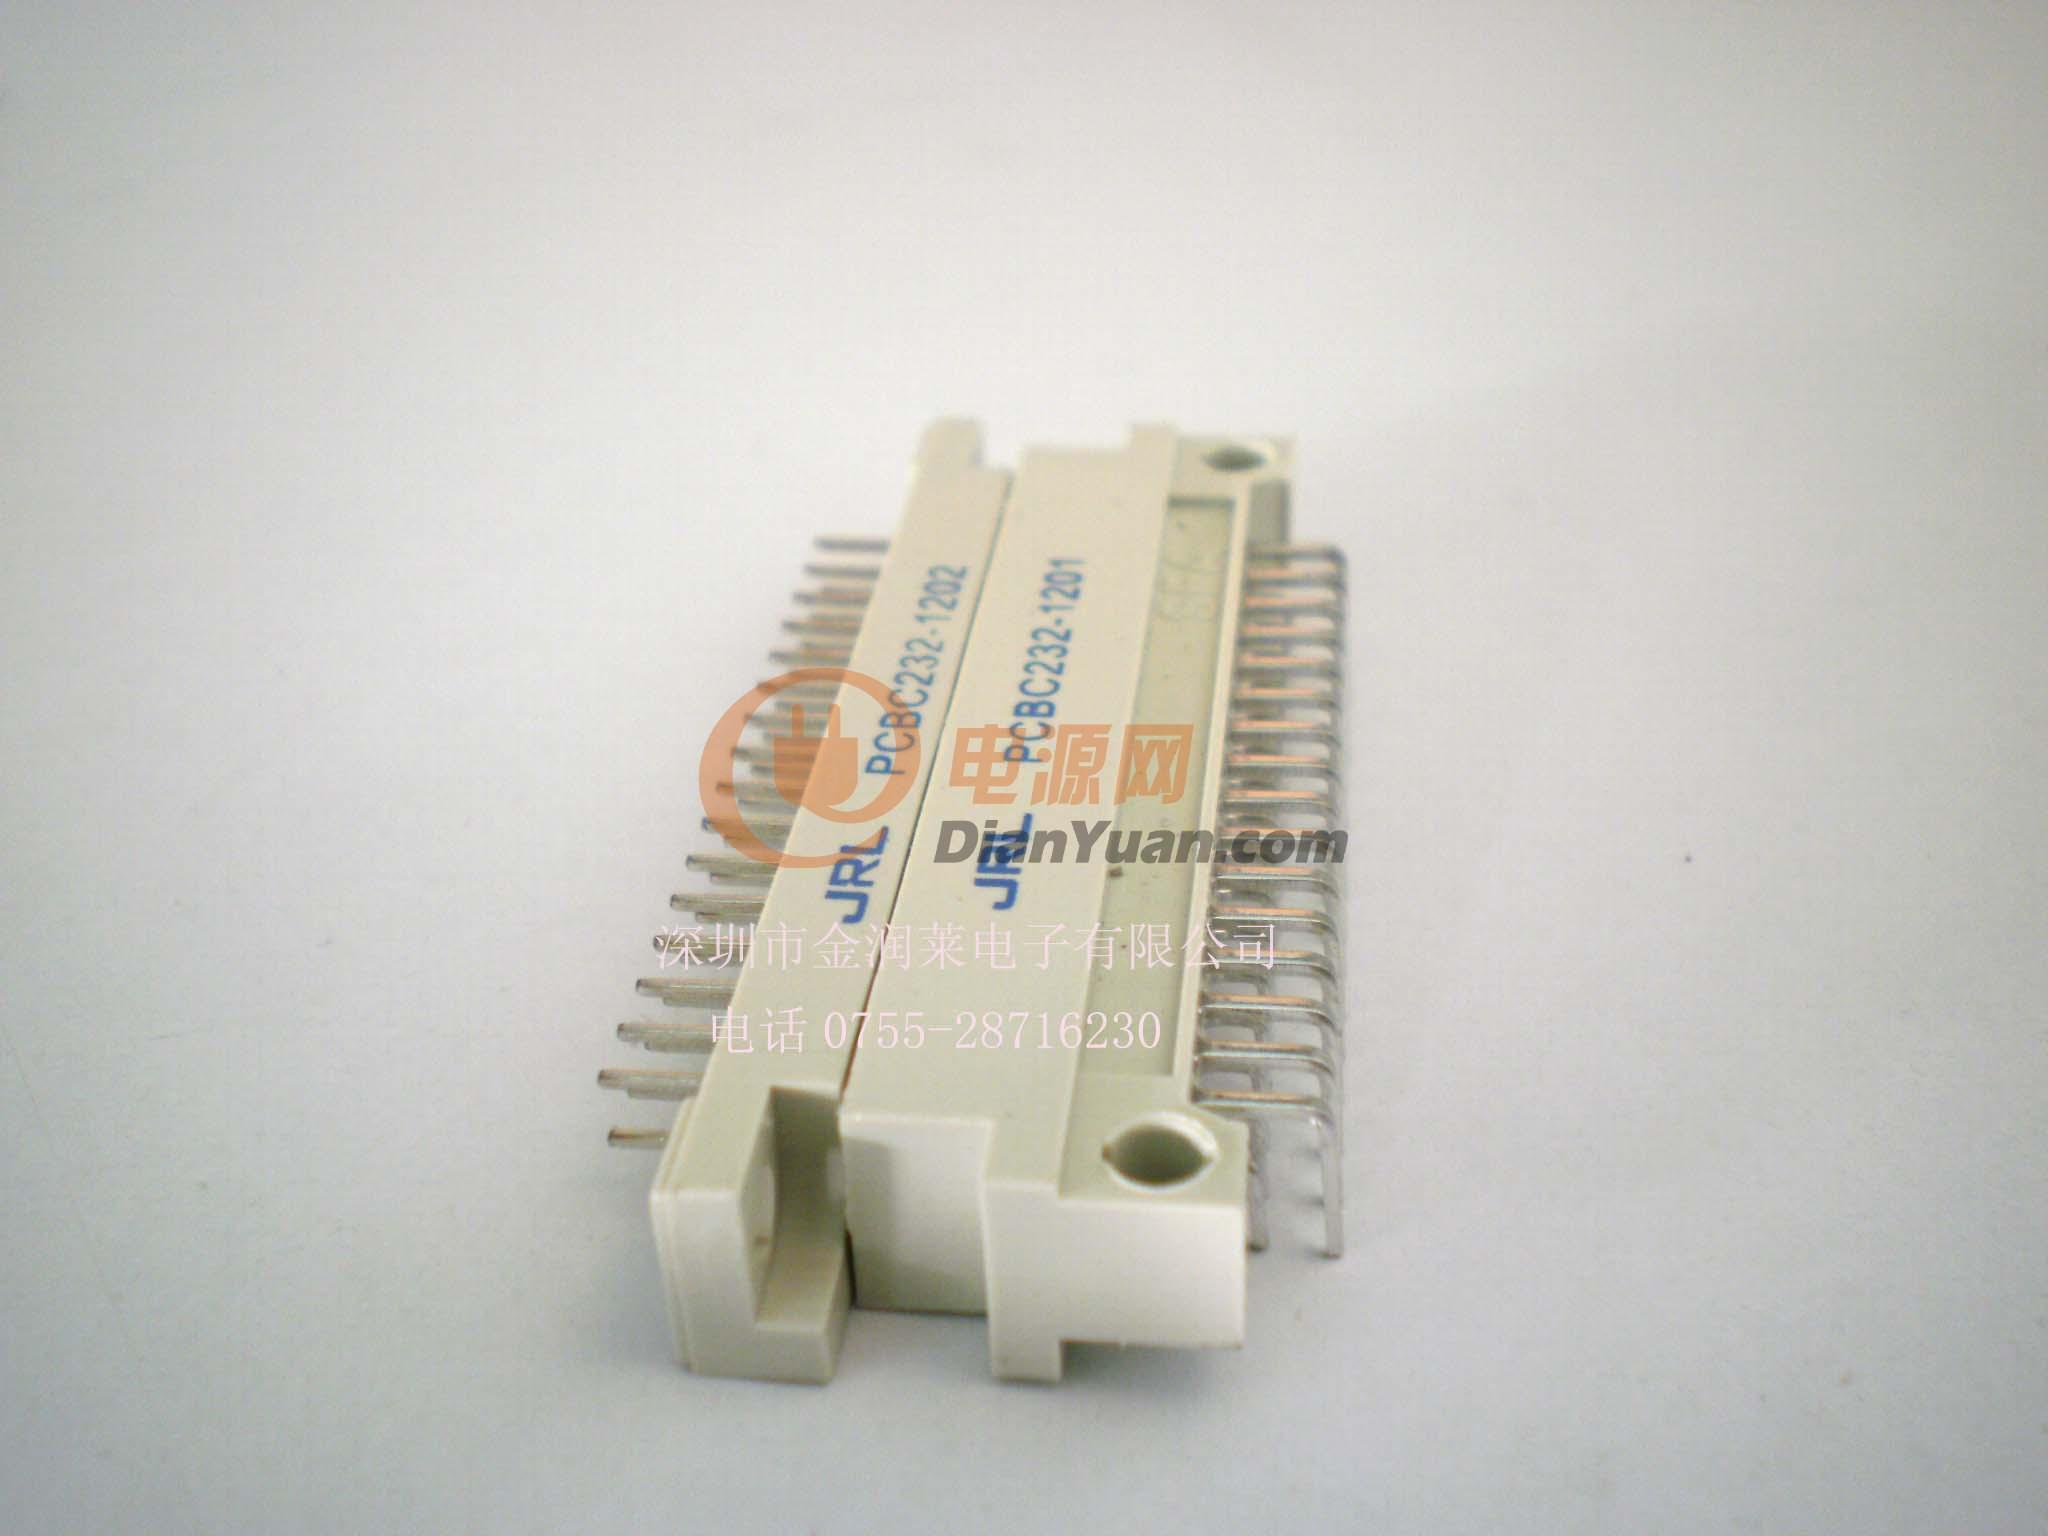 32pin;欧式插座;印制板电源连接器;din61412;jrl;板